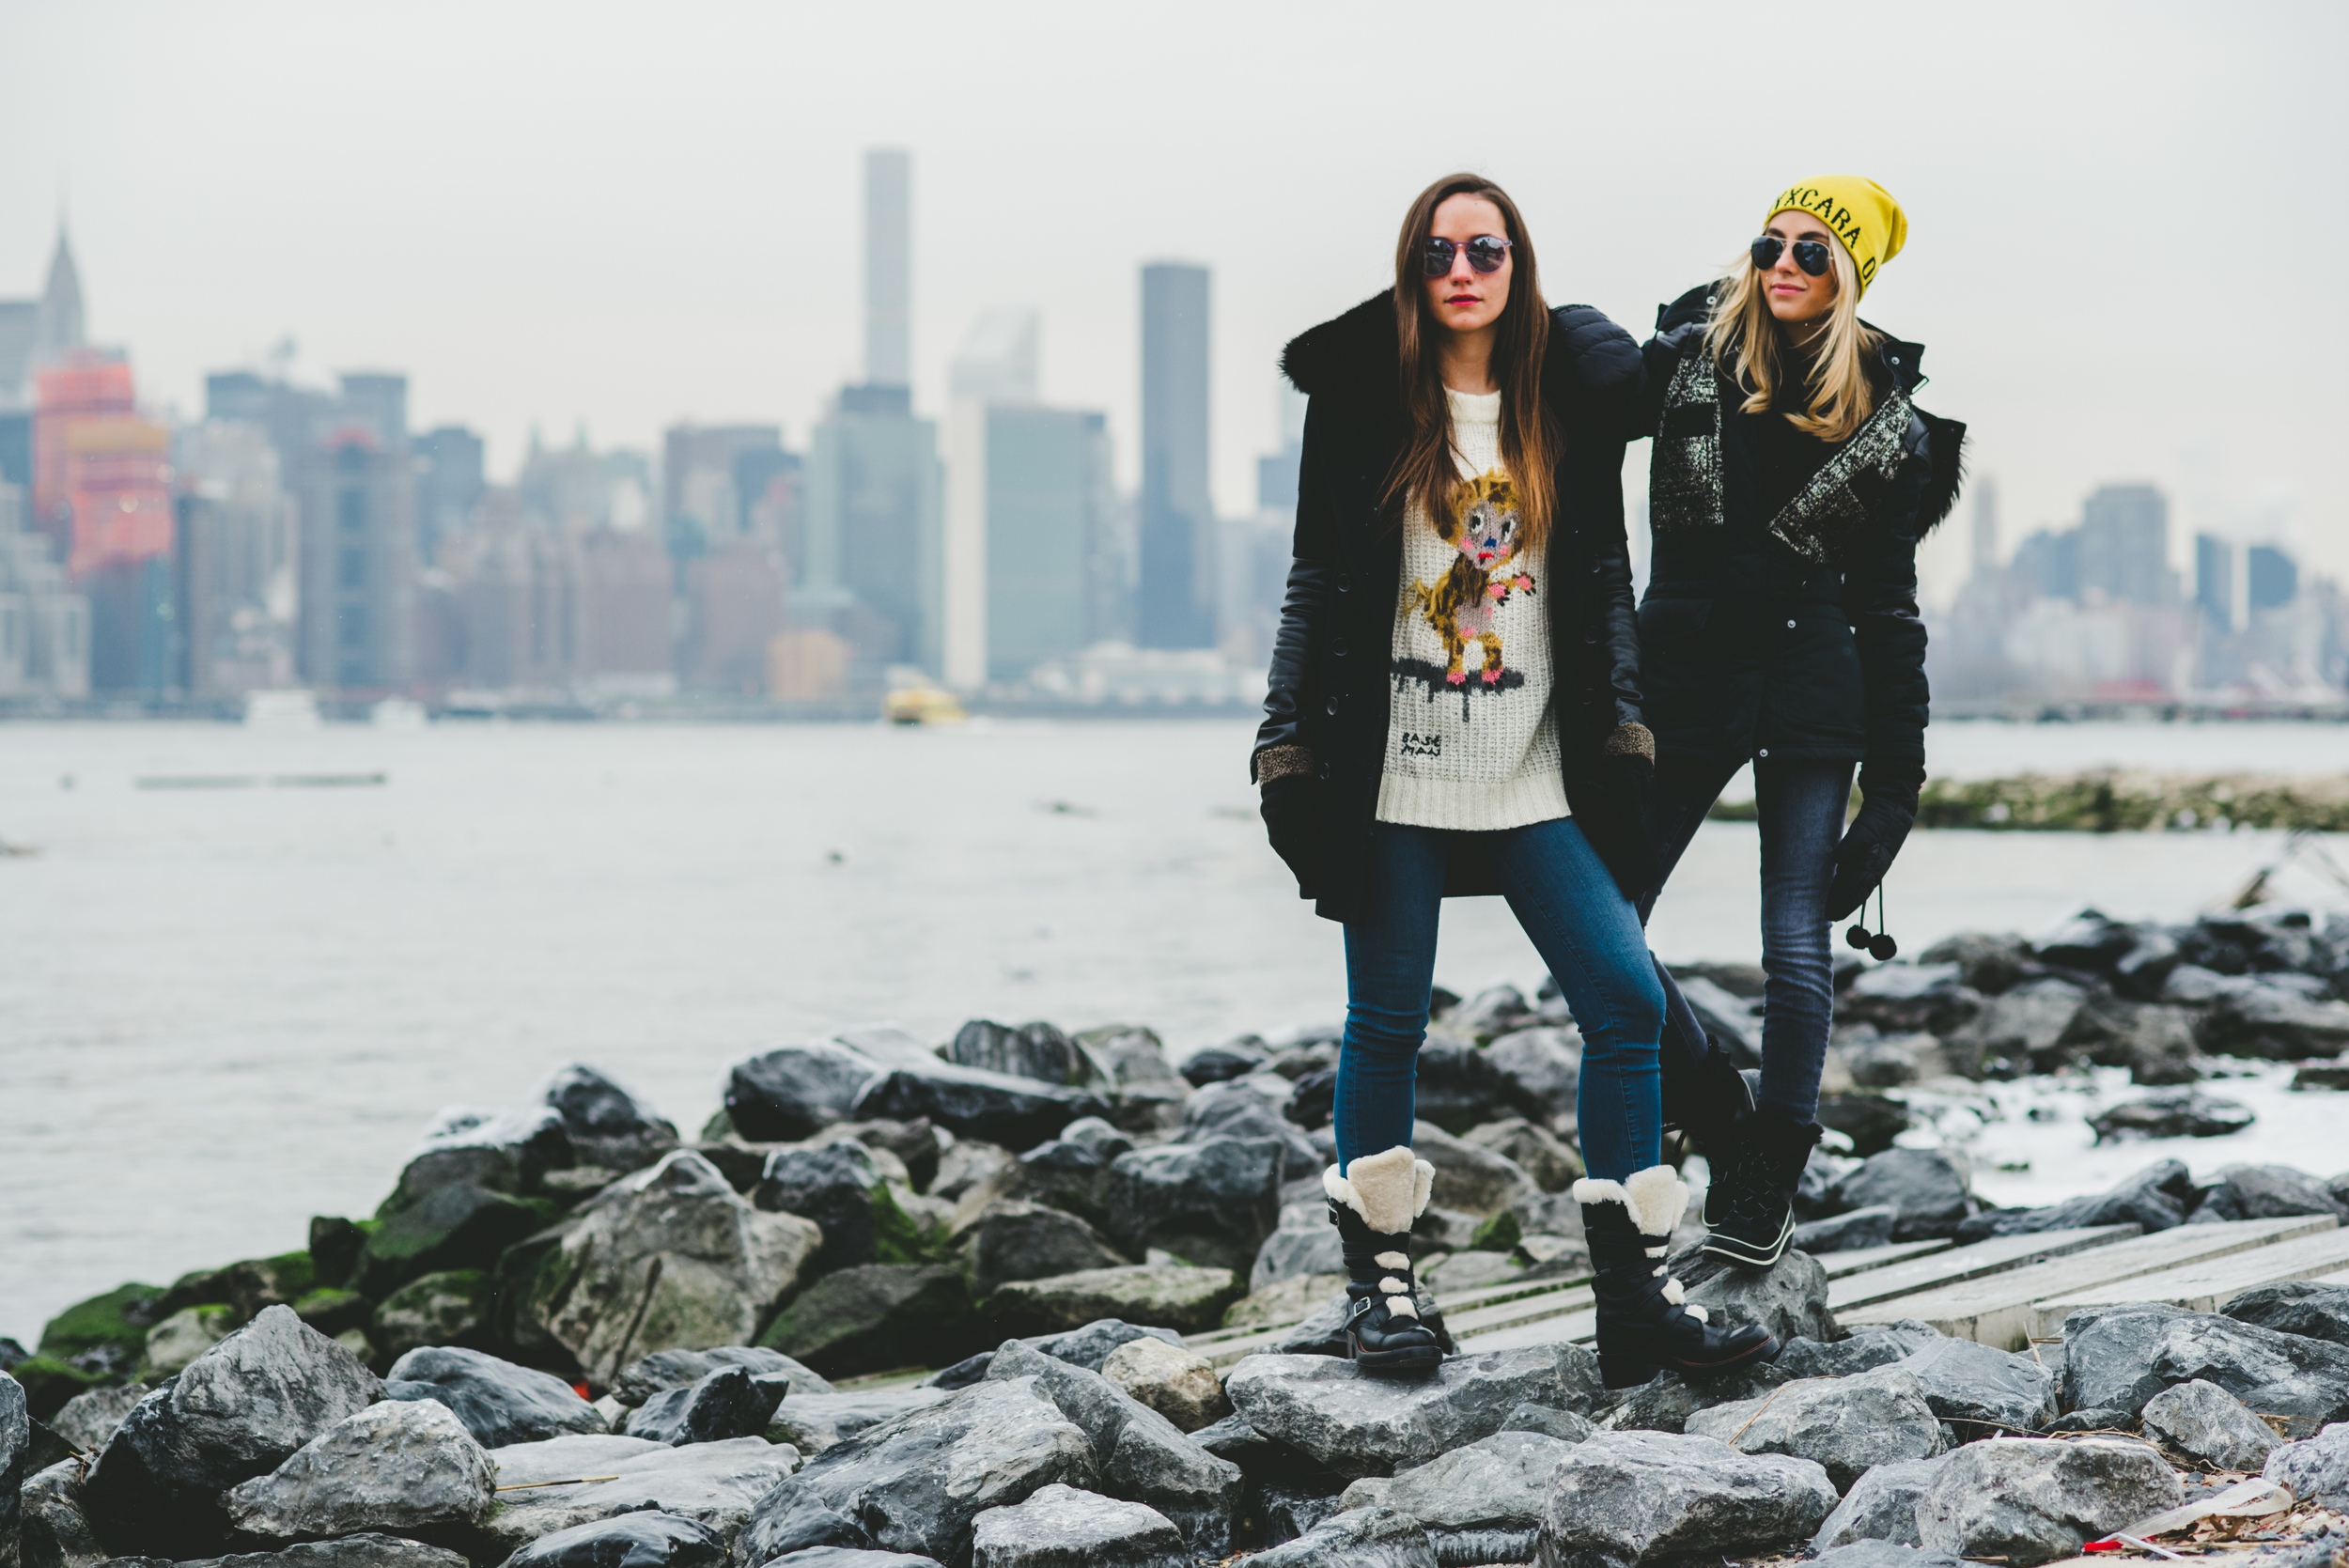 Sophie and Charlotte on Rocks Winter.jpg